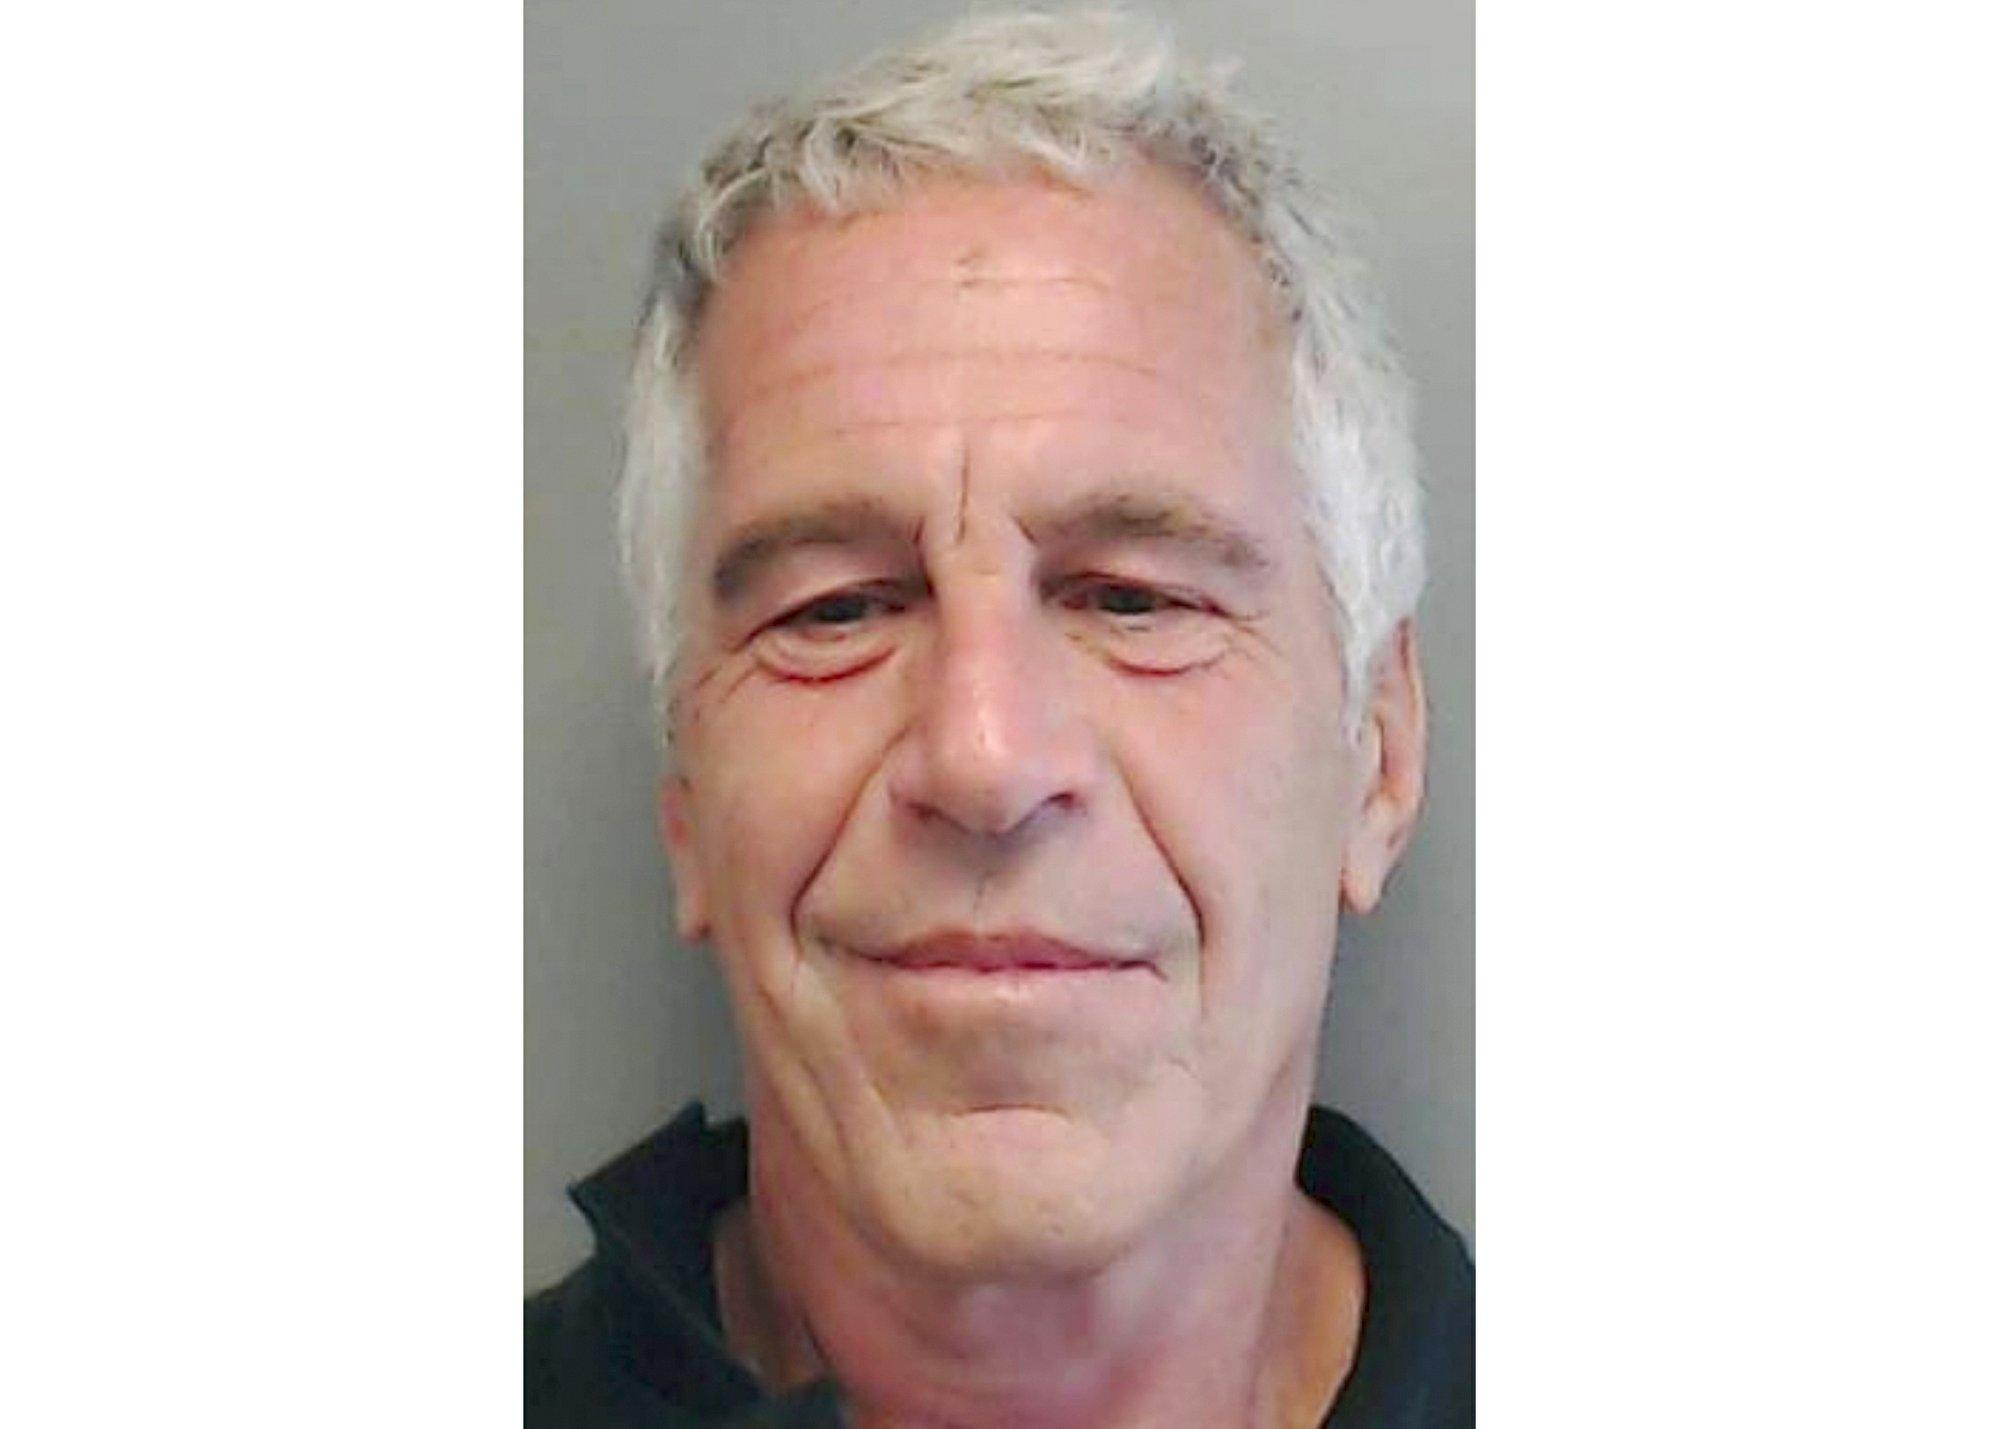 MIT says Jeffrey Epstein donated $800K over 20 years